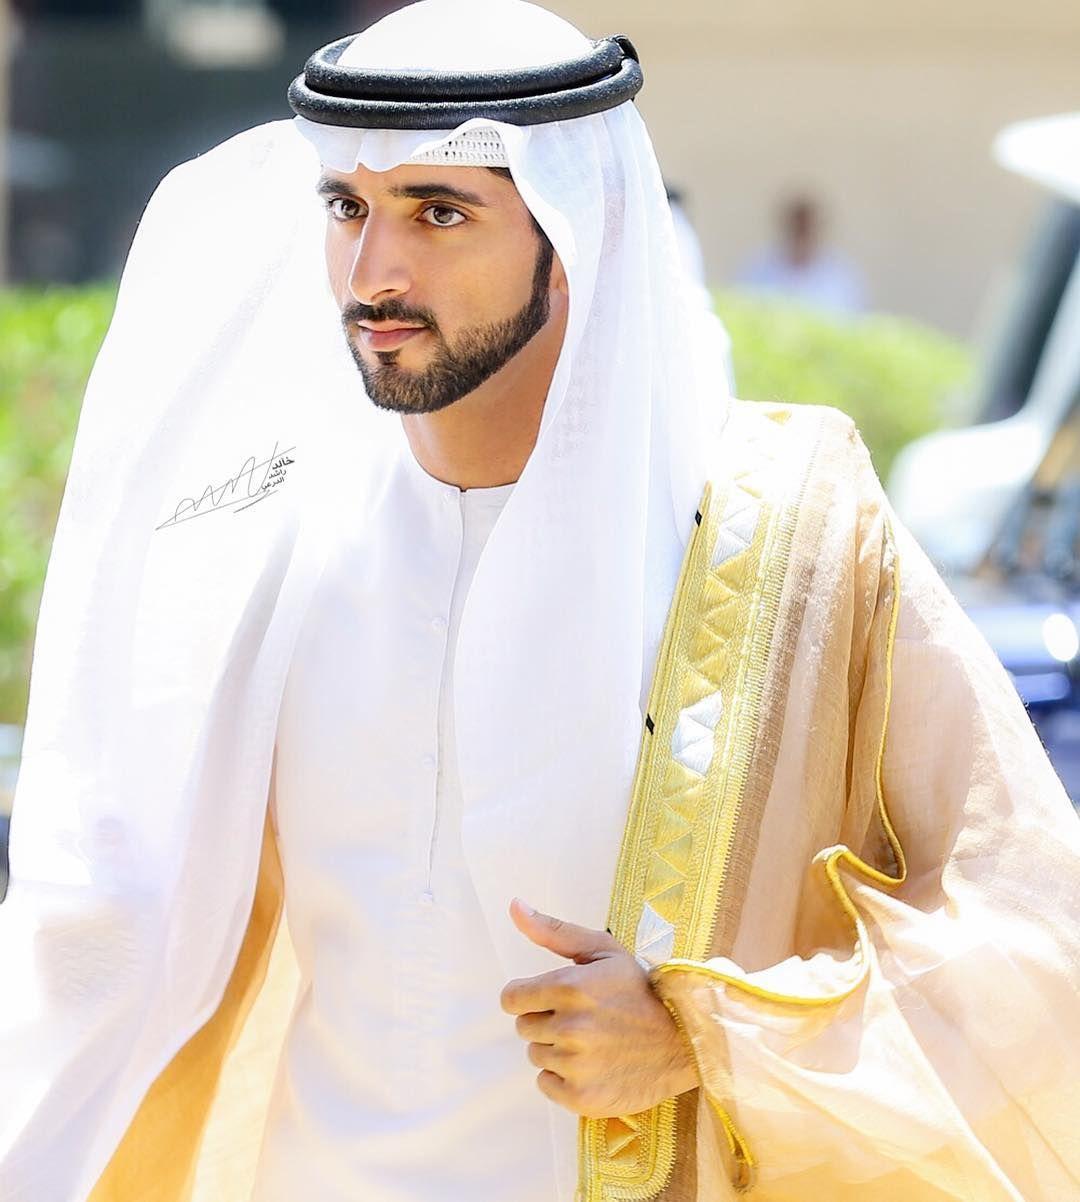 يابخت ليل ضوى فيه ميـلادك كل عام وانته وجه الحياه السعيده Faz3 Handsome Prince My Prince Charming Beautiful Men